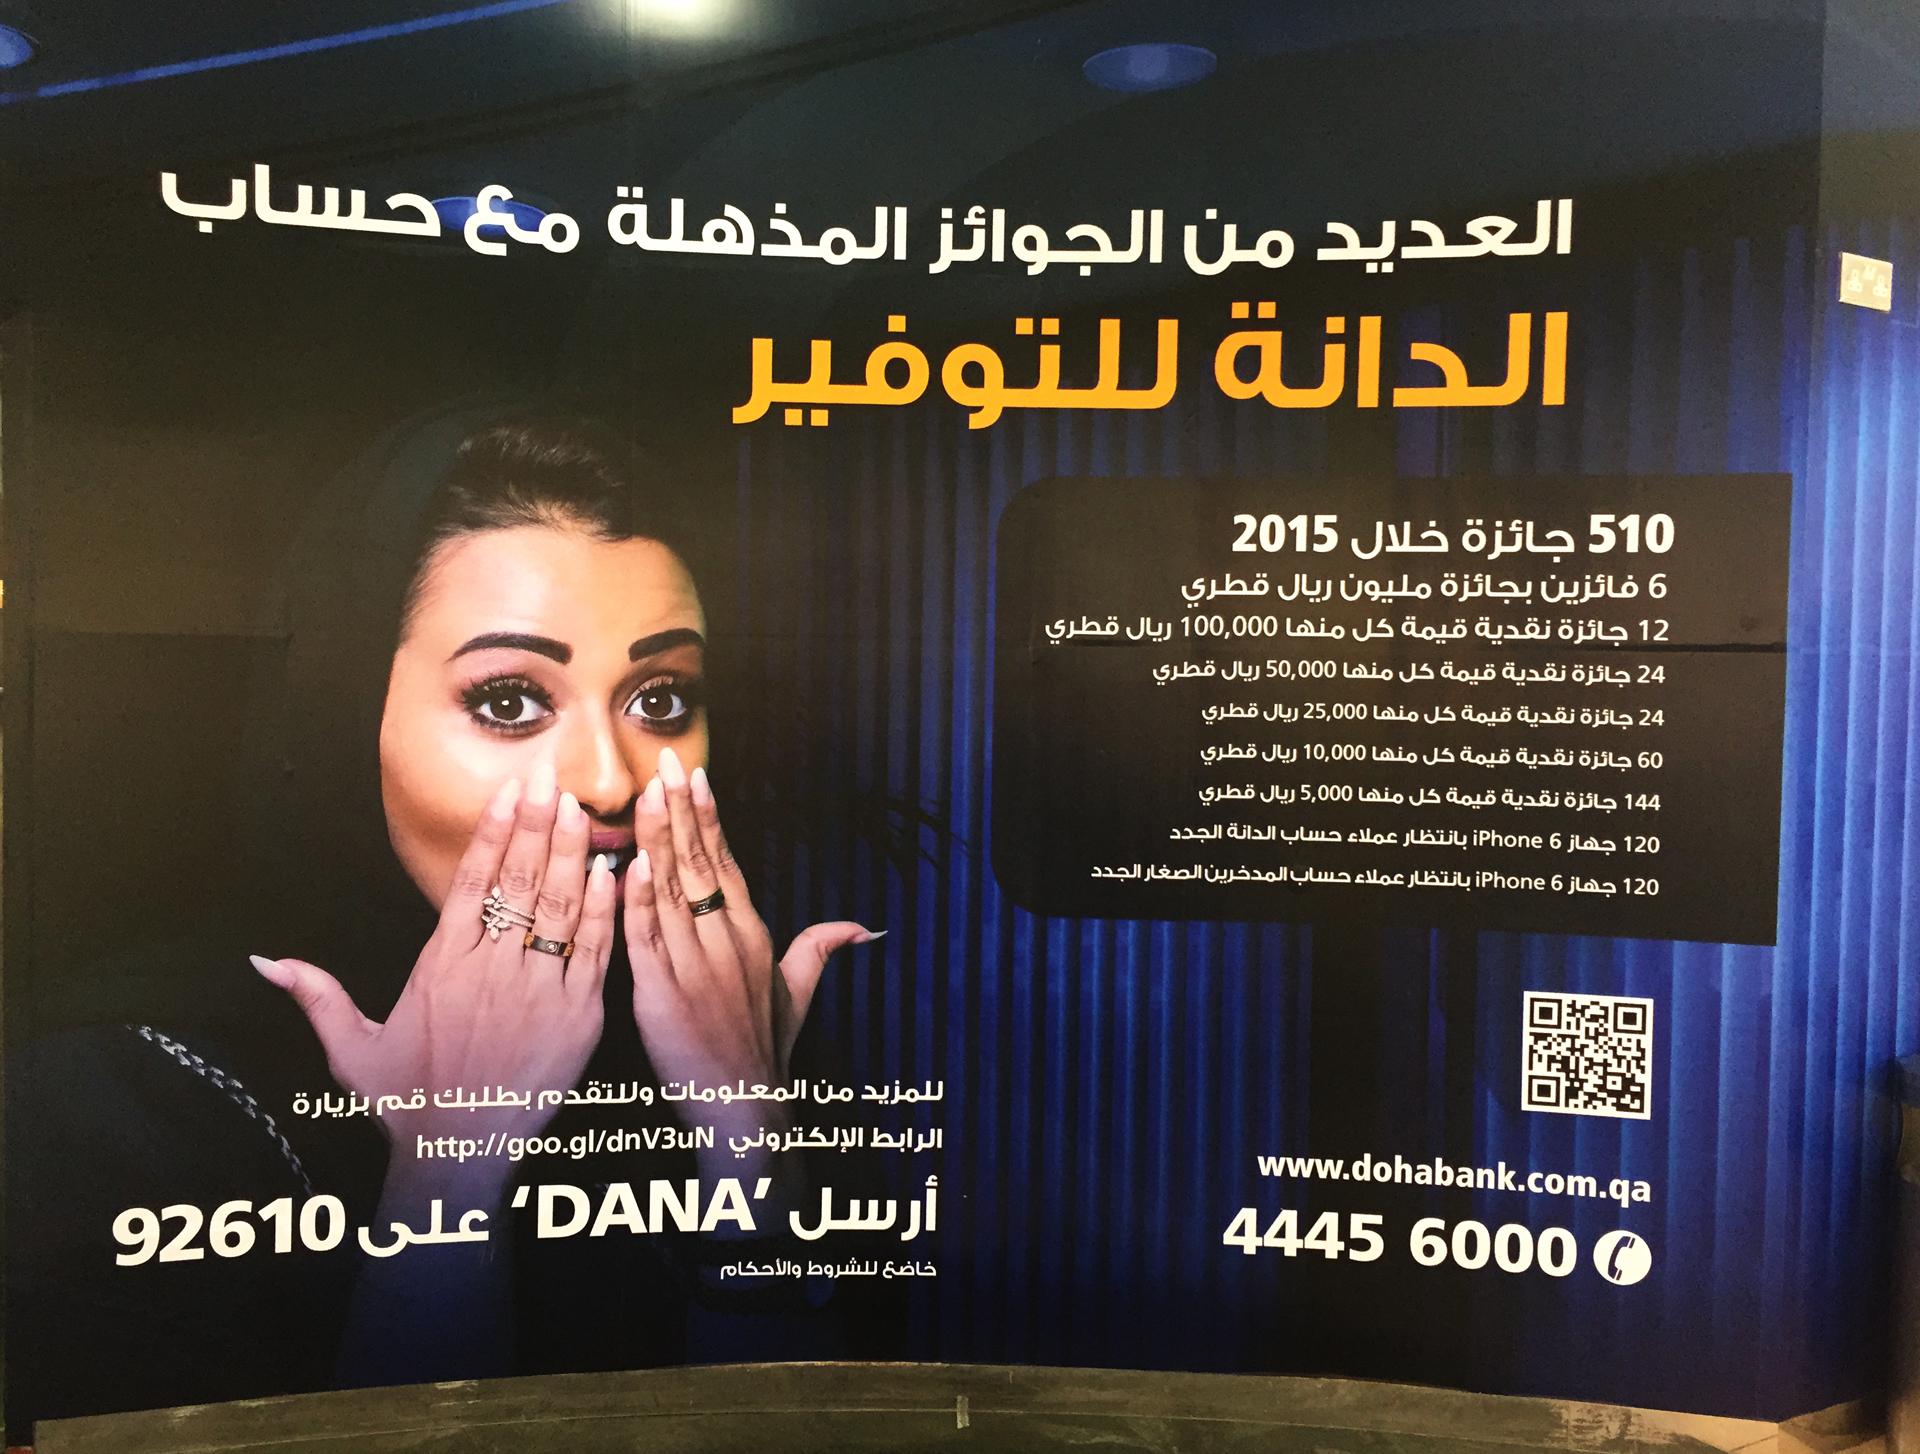 Doha_Bank_Juliette_Sawyer2